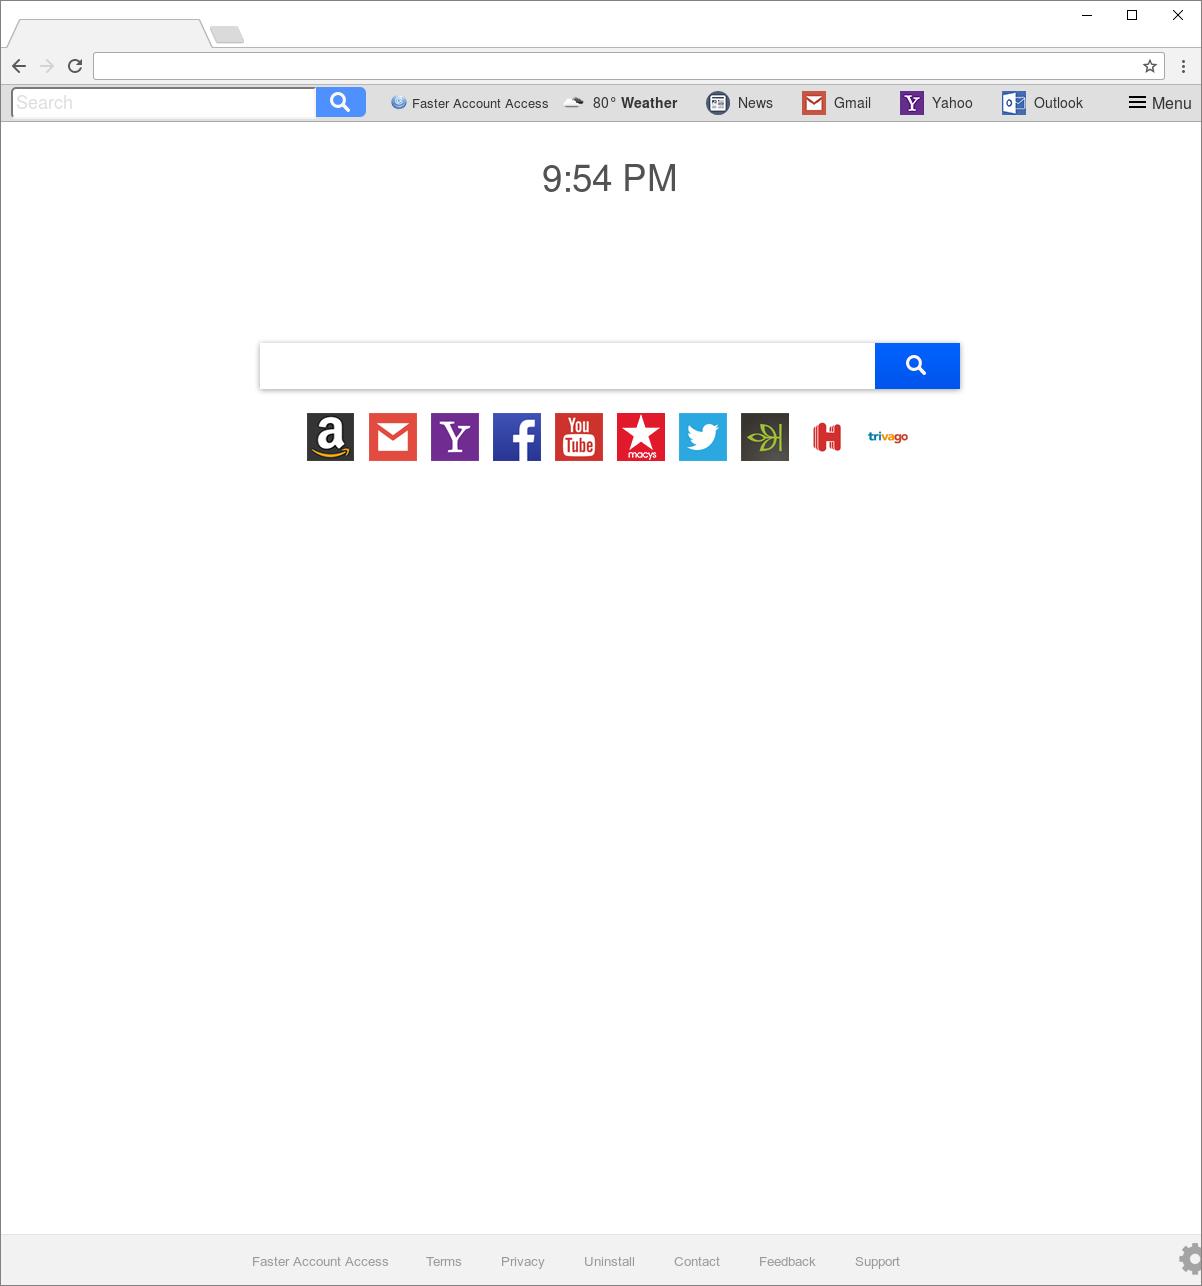 Search.searchfaa2.com Hijacker